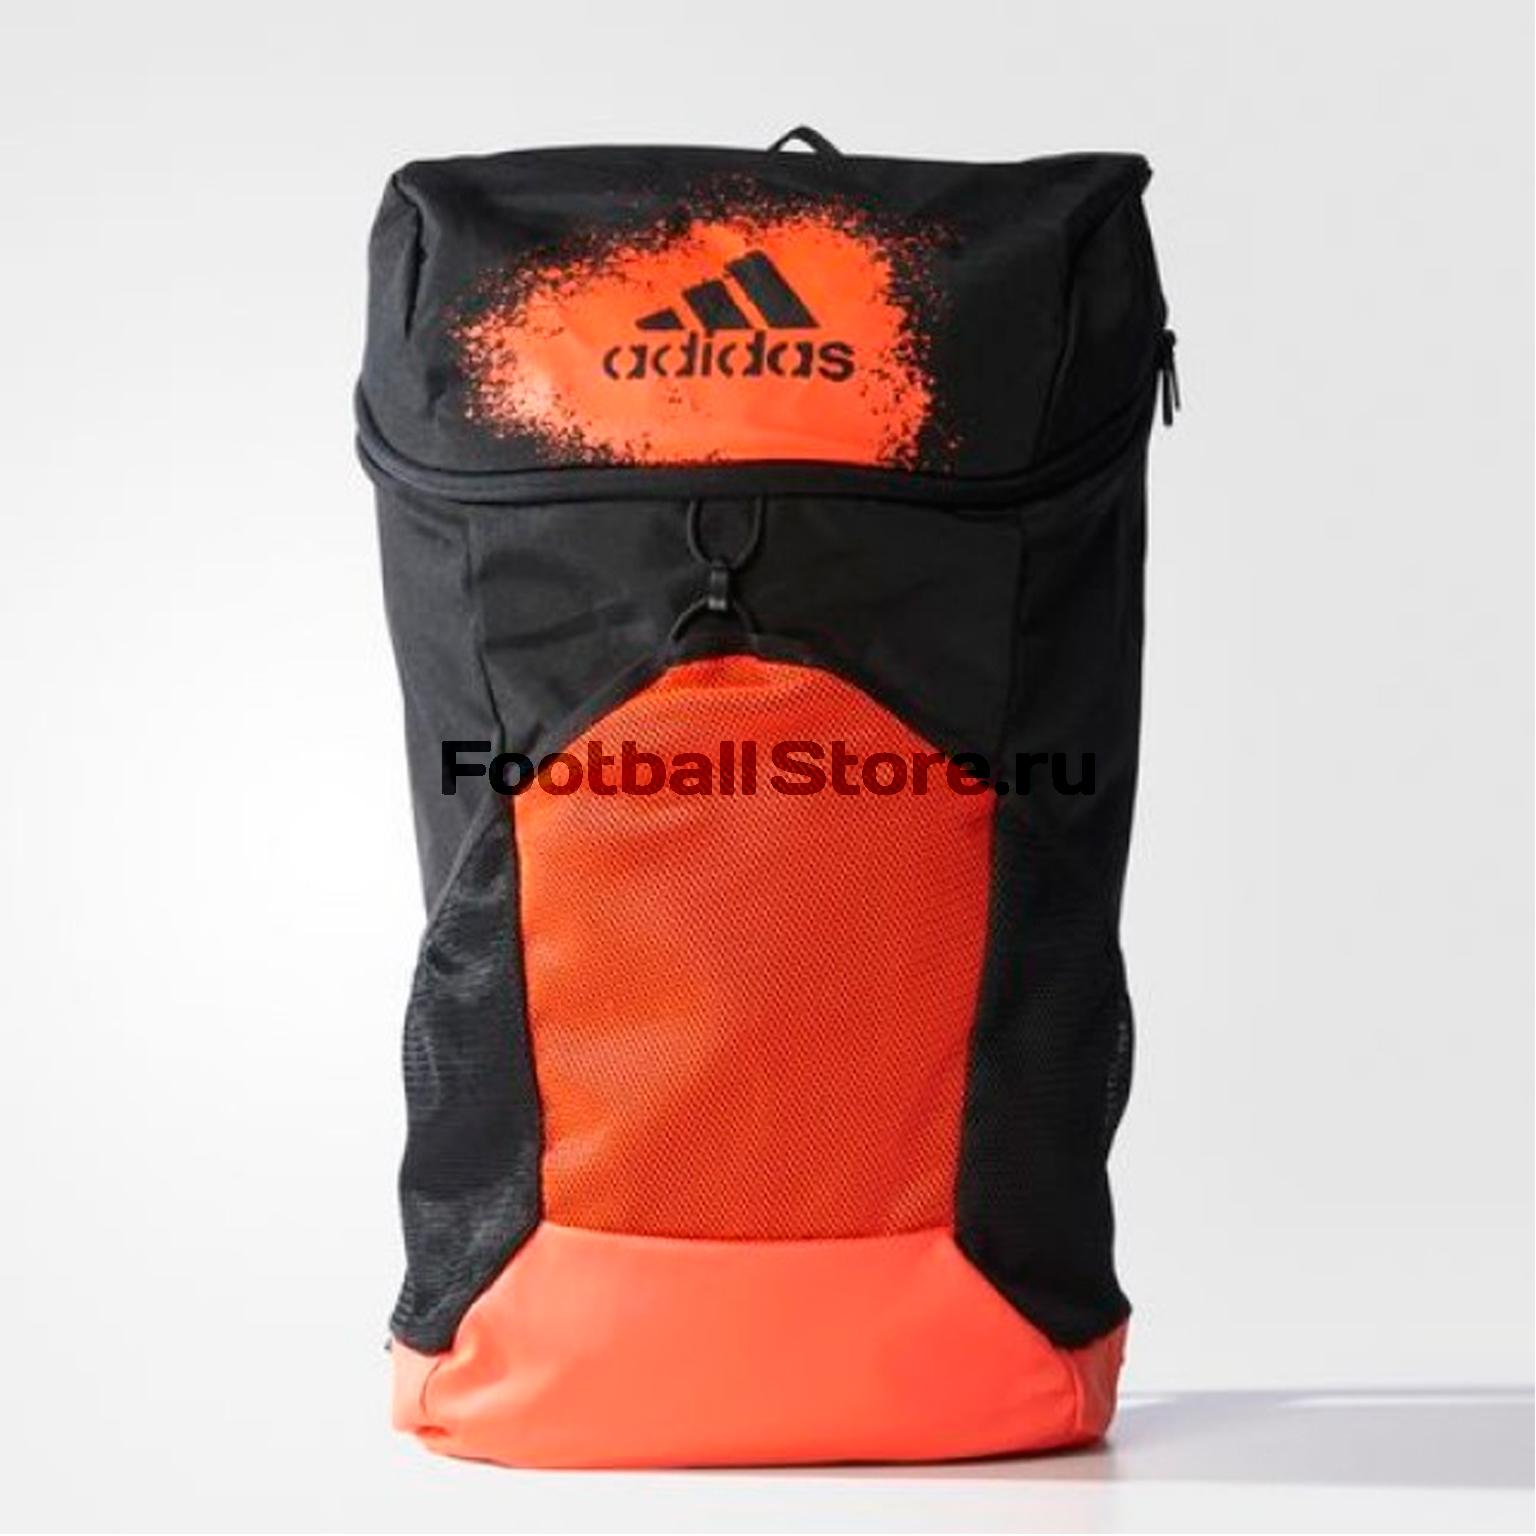 Сумки/Рюкзаки Adidas Рюкзак Adidas X BP 16.2 S94746 рюкзаки reebok рюкзак style found seek bp black